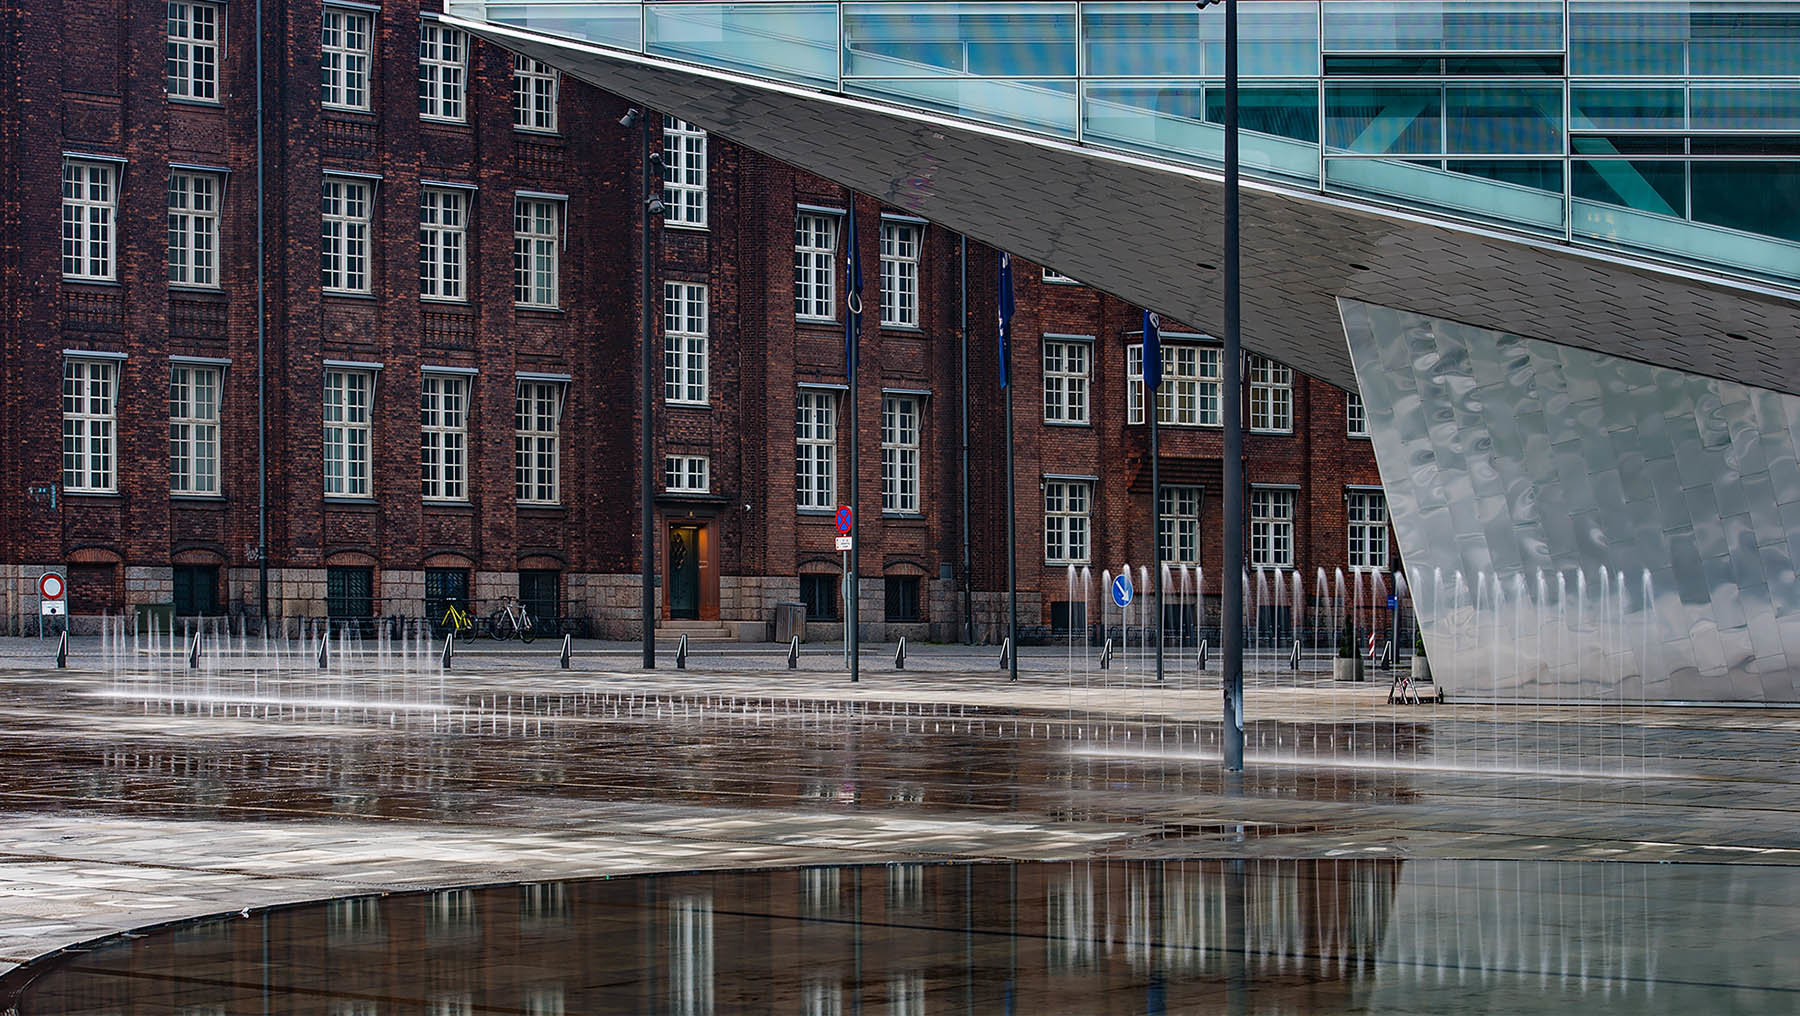 Fontann w Kopenhadze